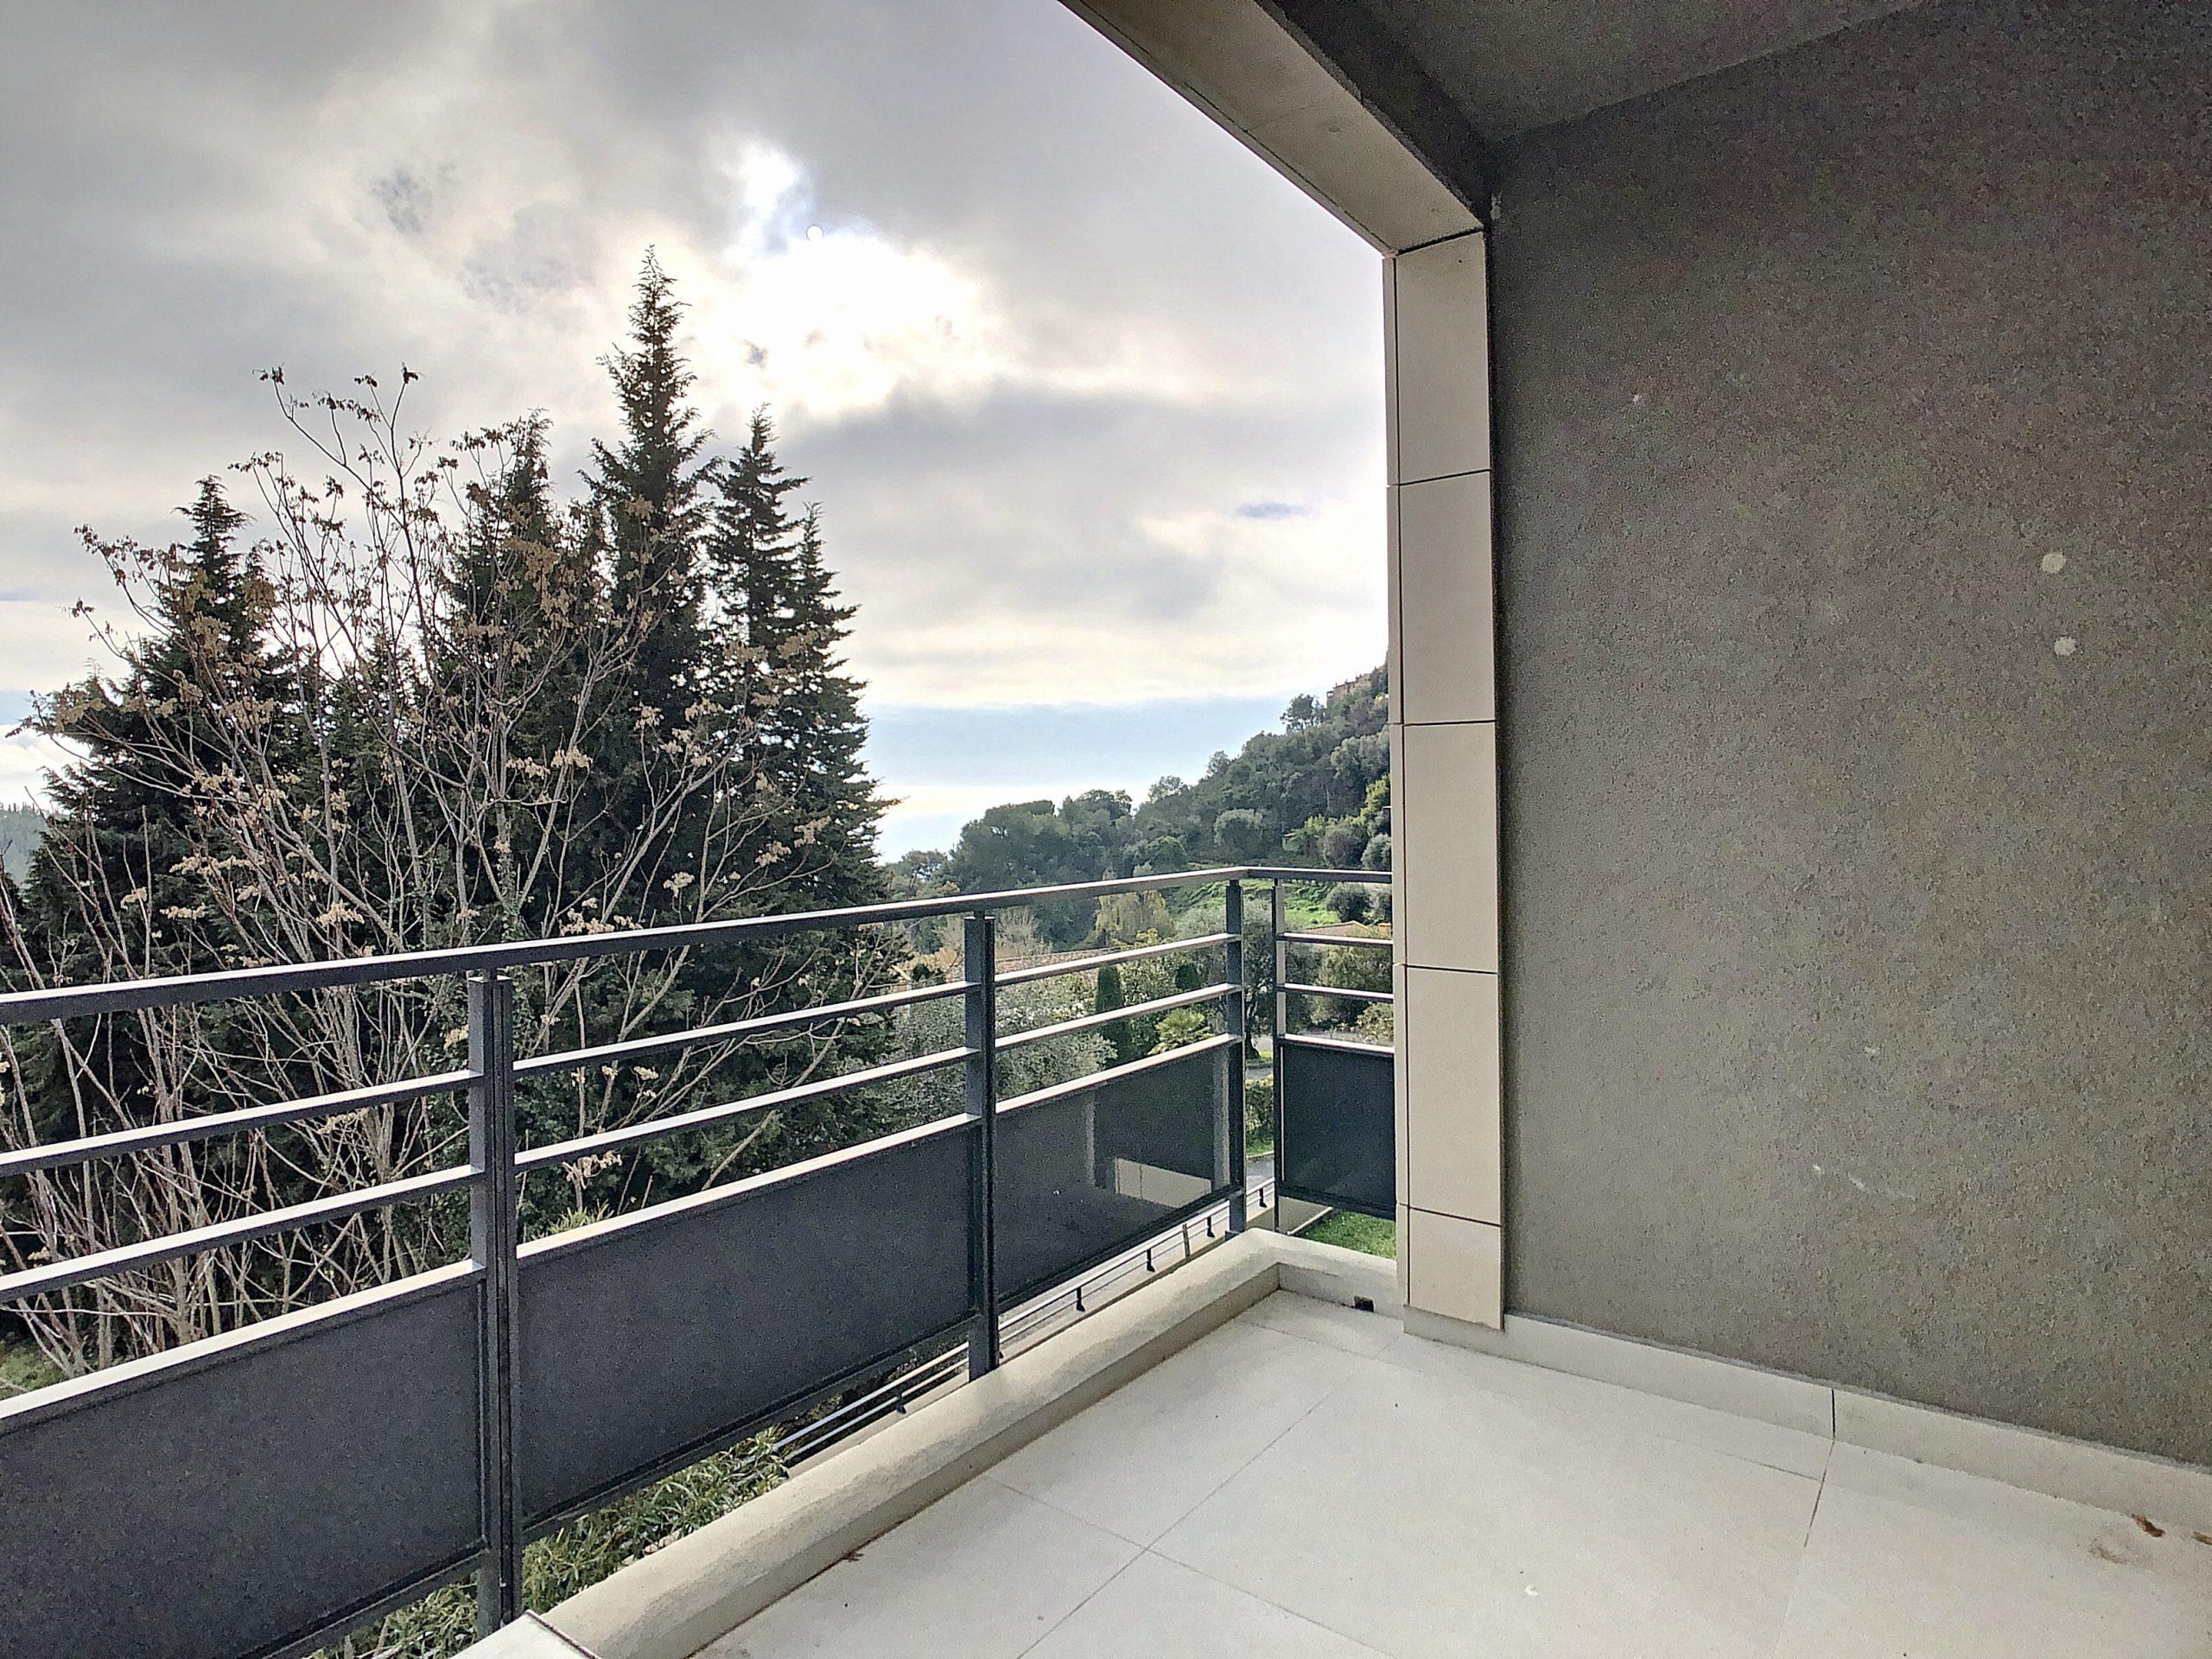 Colline d'Eze – Agréable studio avec jardin privatif et terrasse